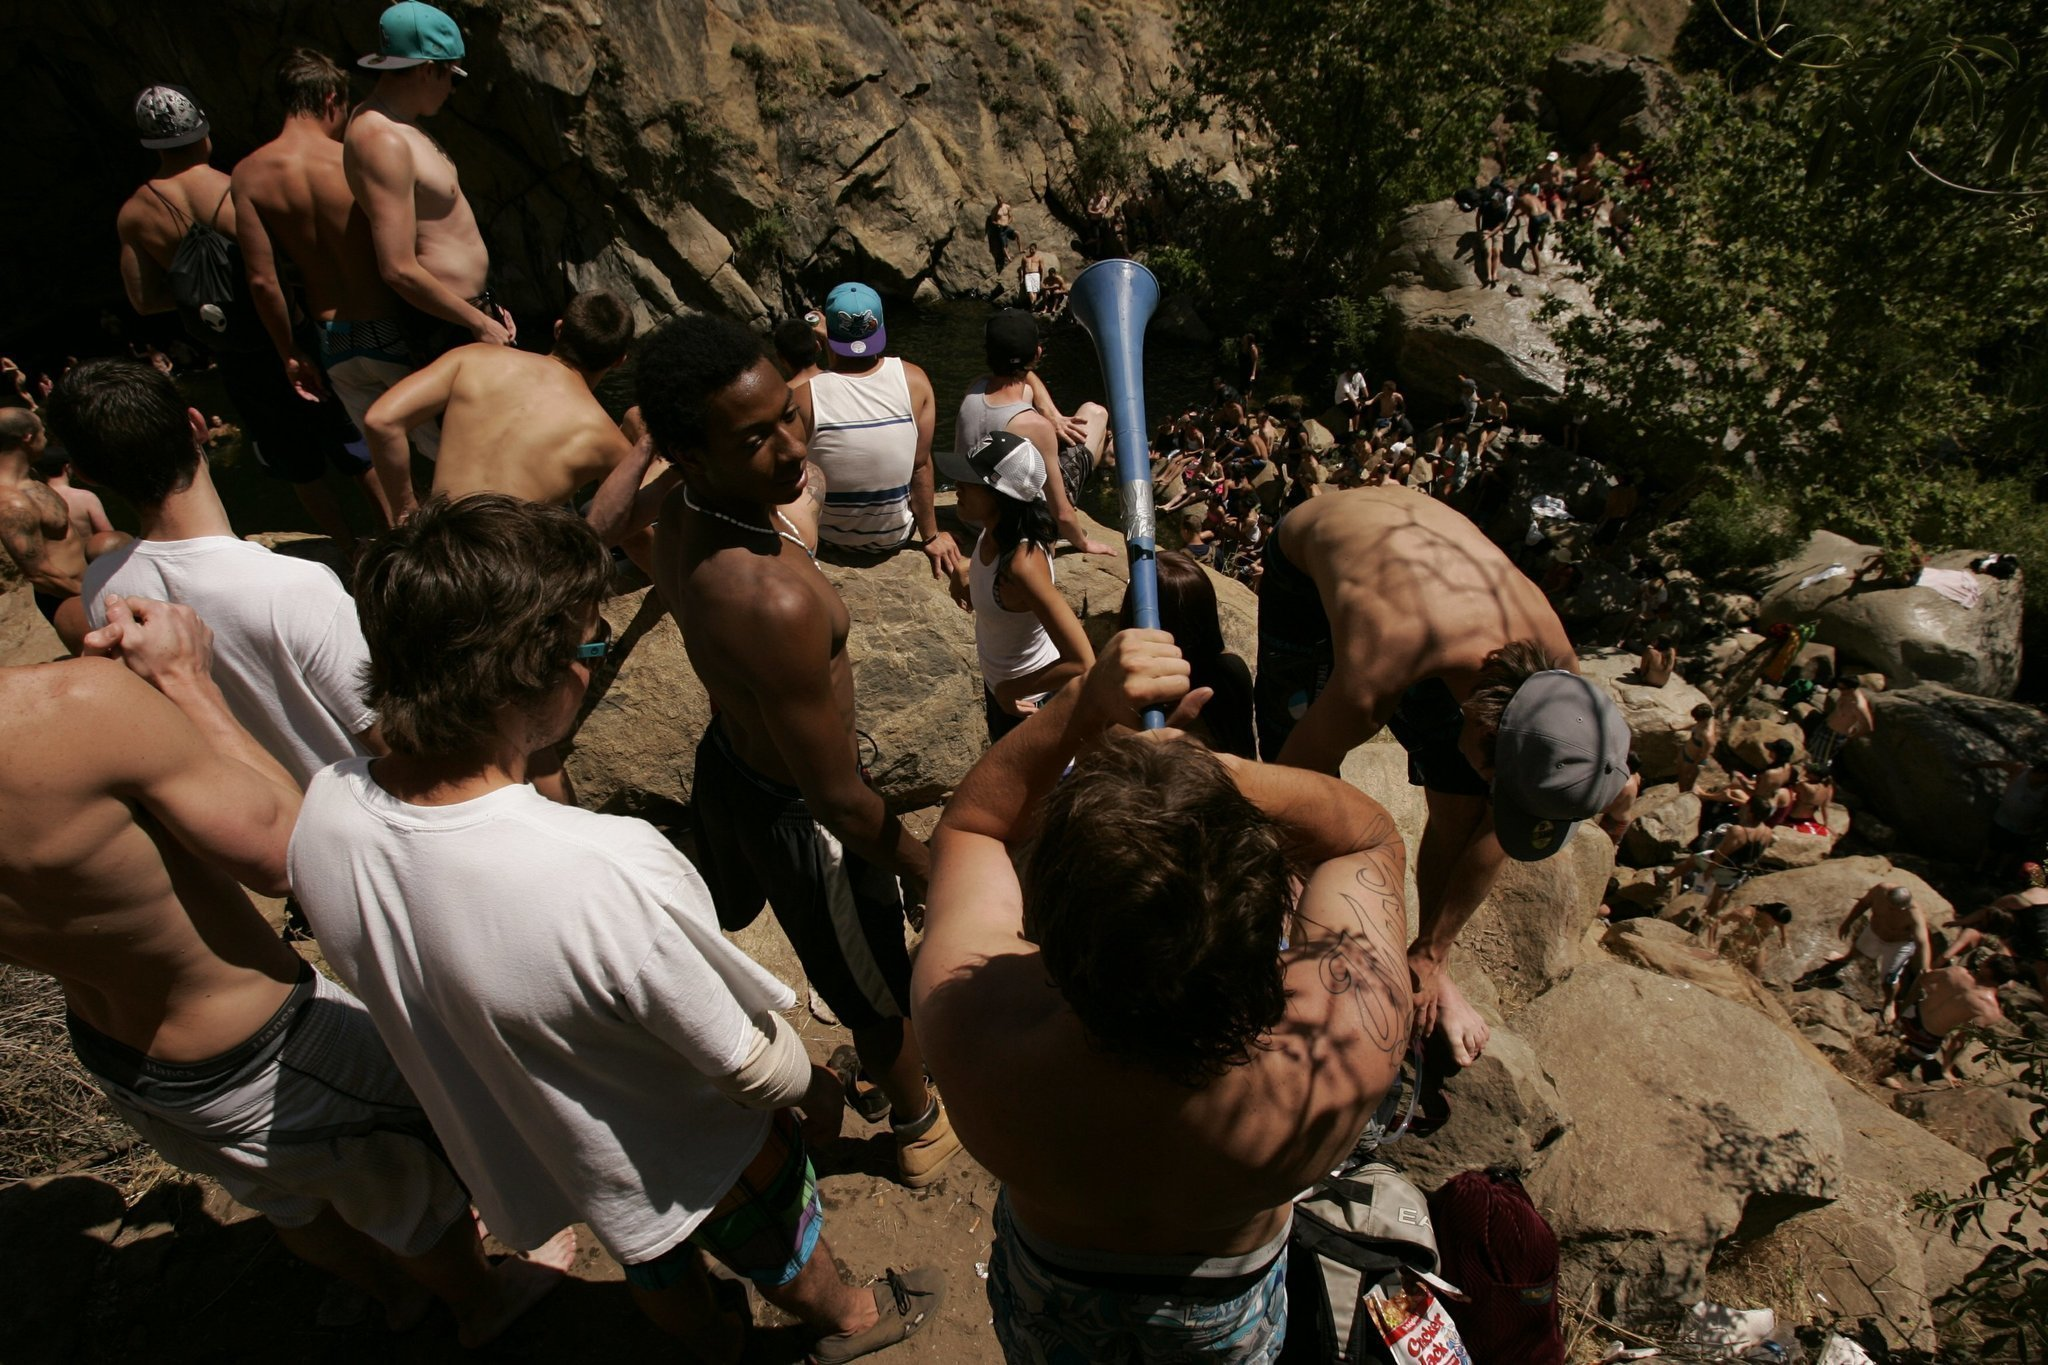 cedar creek falls restrictions a success - the san diego union-tribune